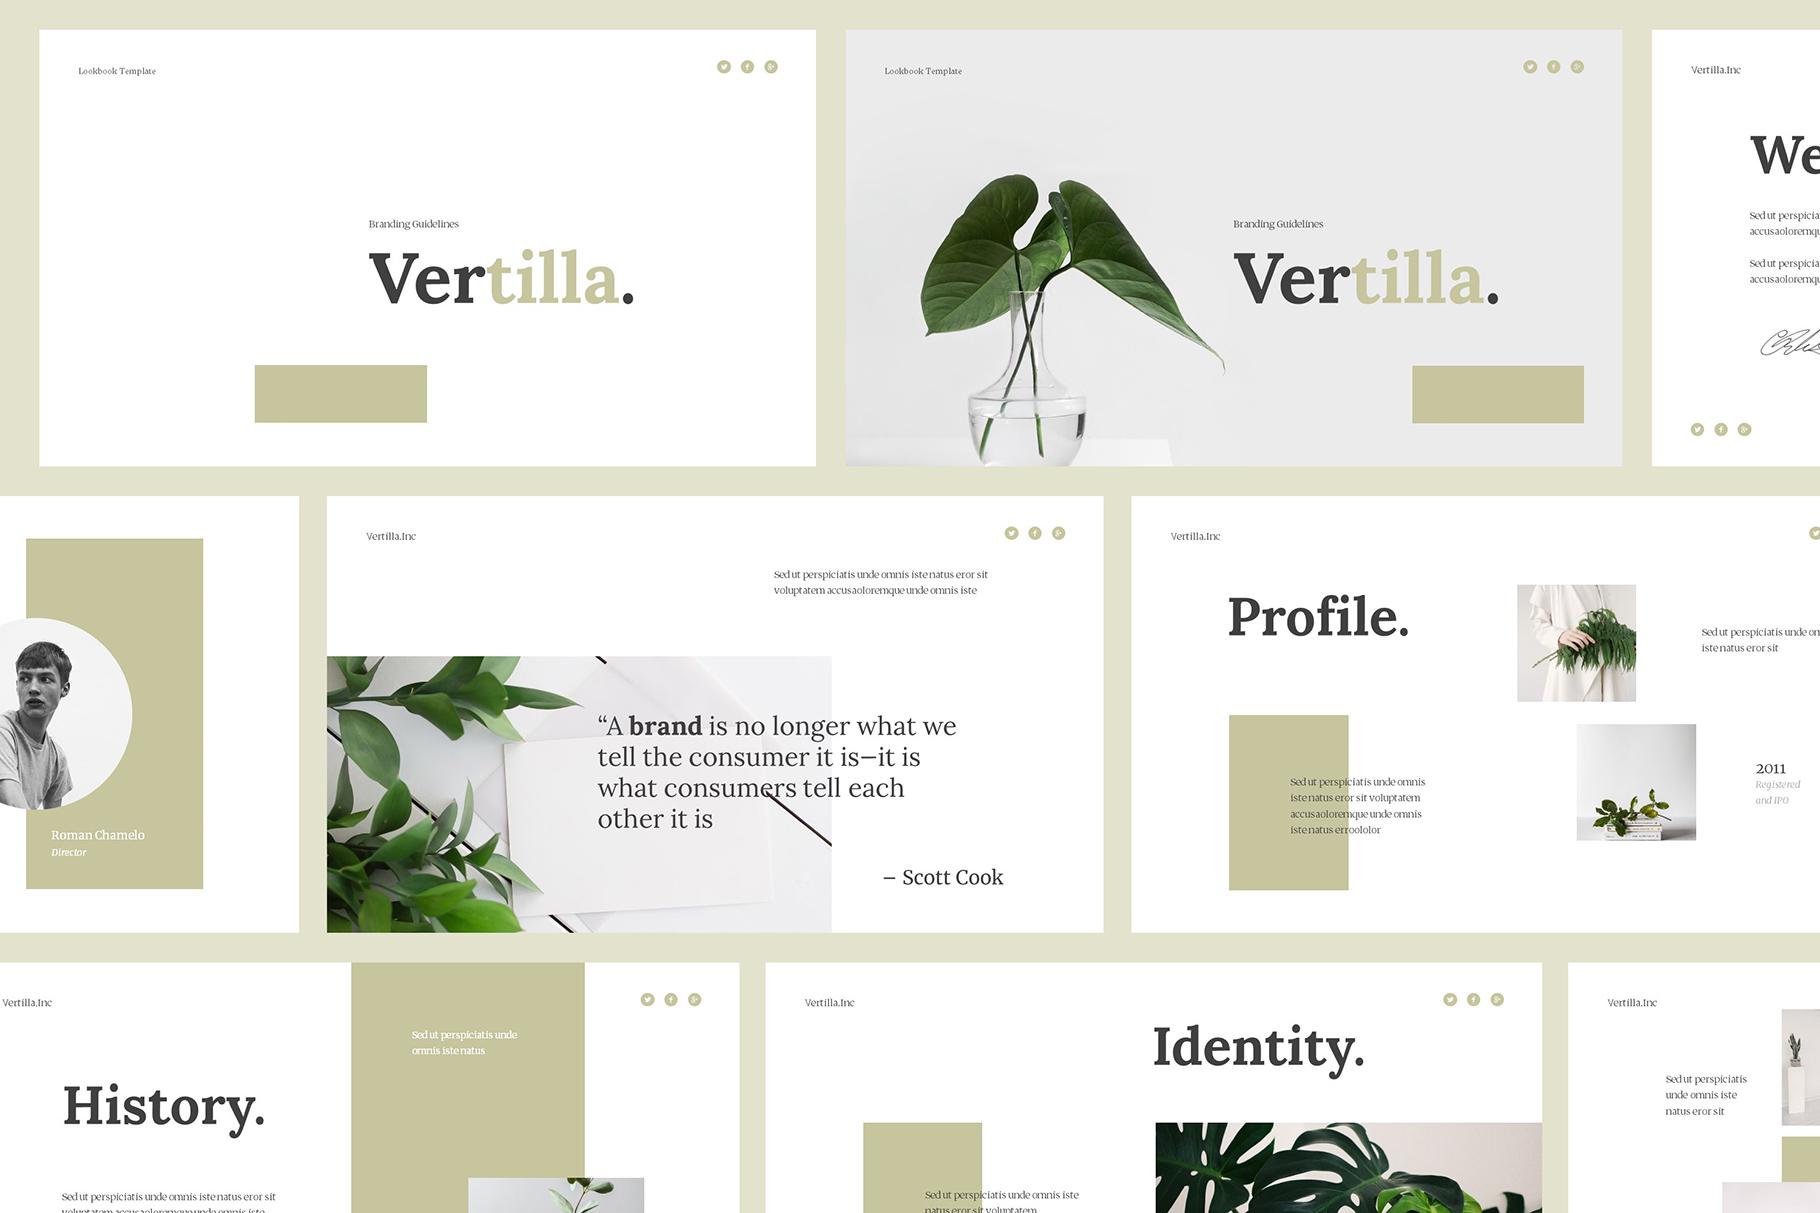 Vertilla-Brand Guideline Keynote example image 2